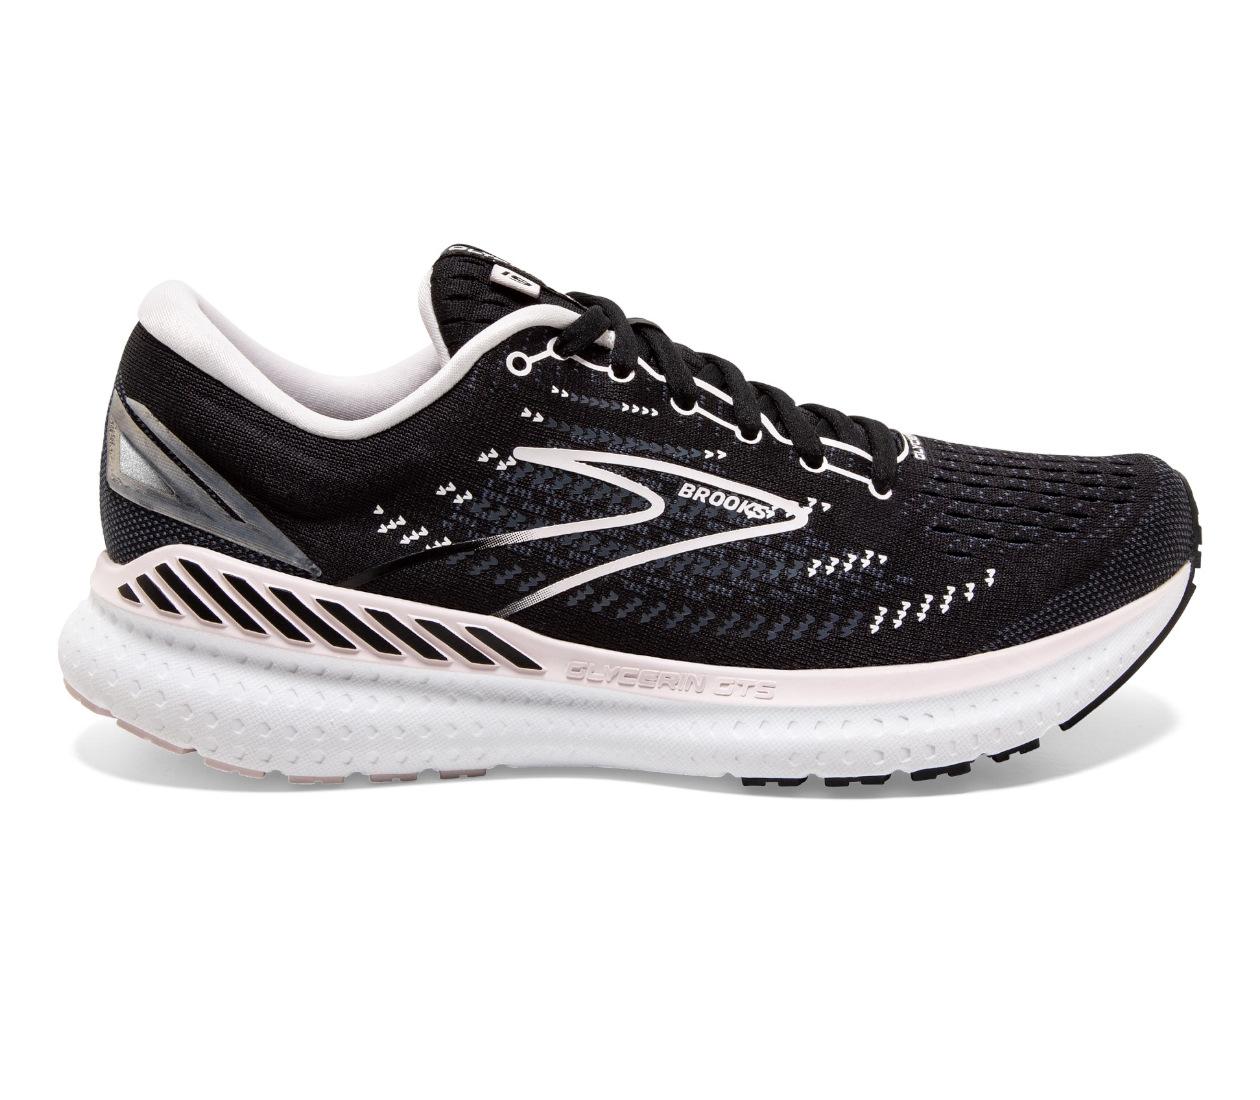 Brooks Glycerin Gts 19 (W) scarpe running per pronazione   LBM Sport